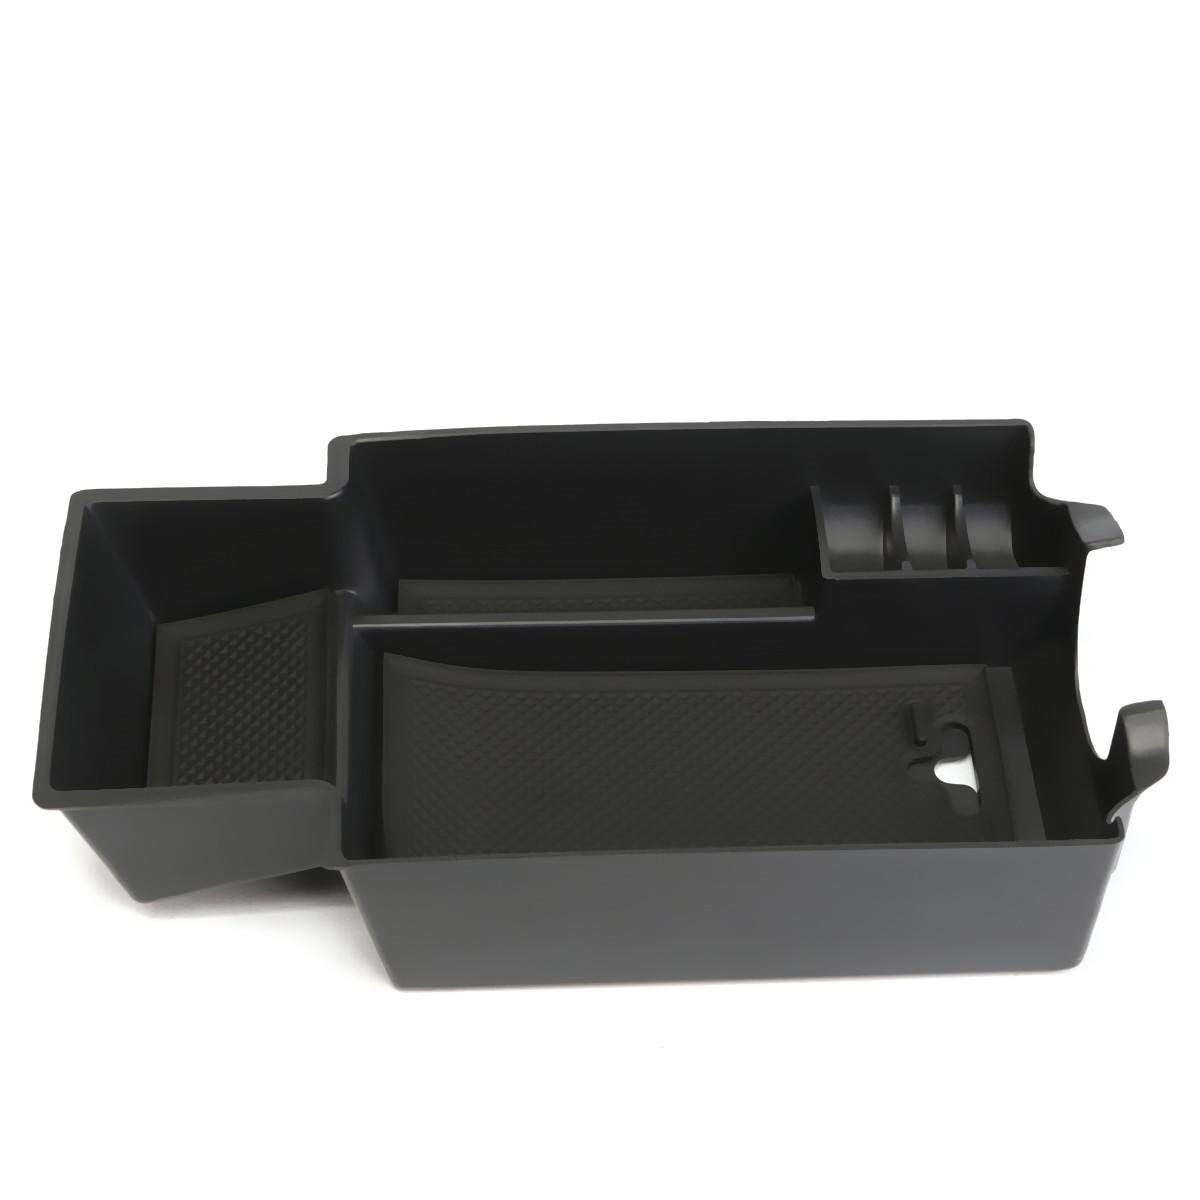 Buy 24CM Car Central Storage Box Holder w/Anti-skid Pads For Benz A B CLA GLA Series